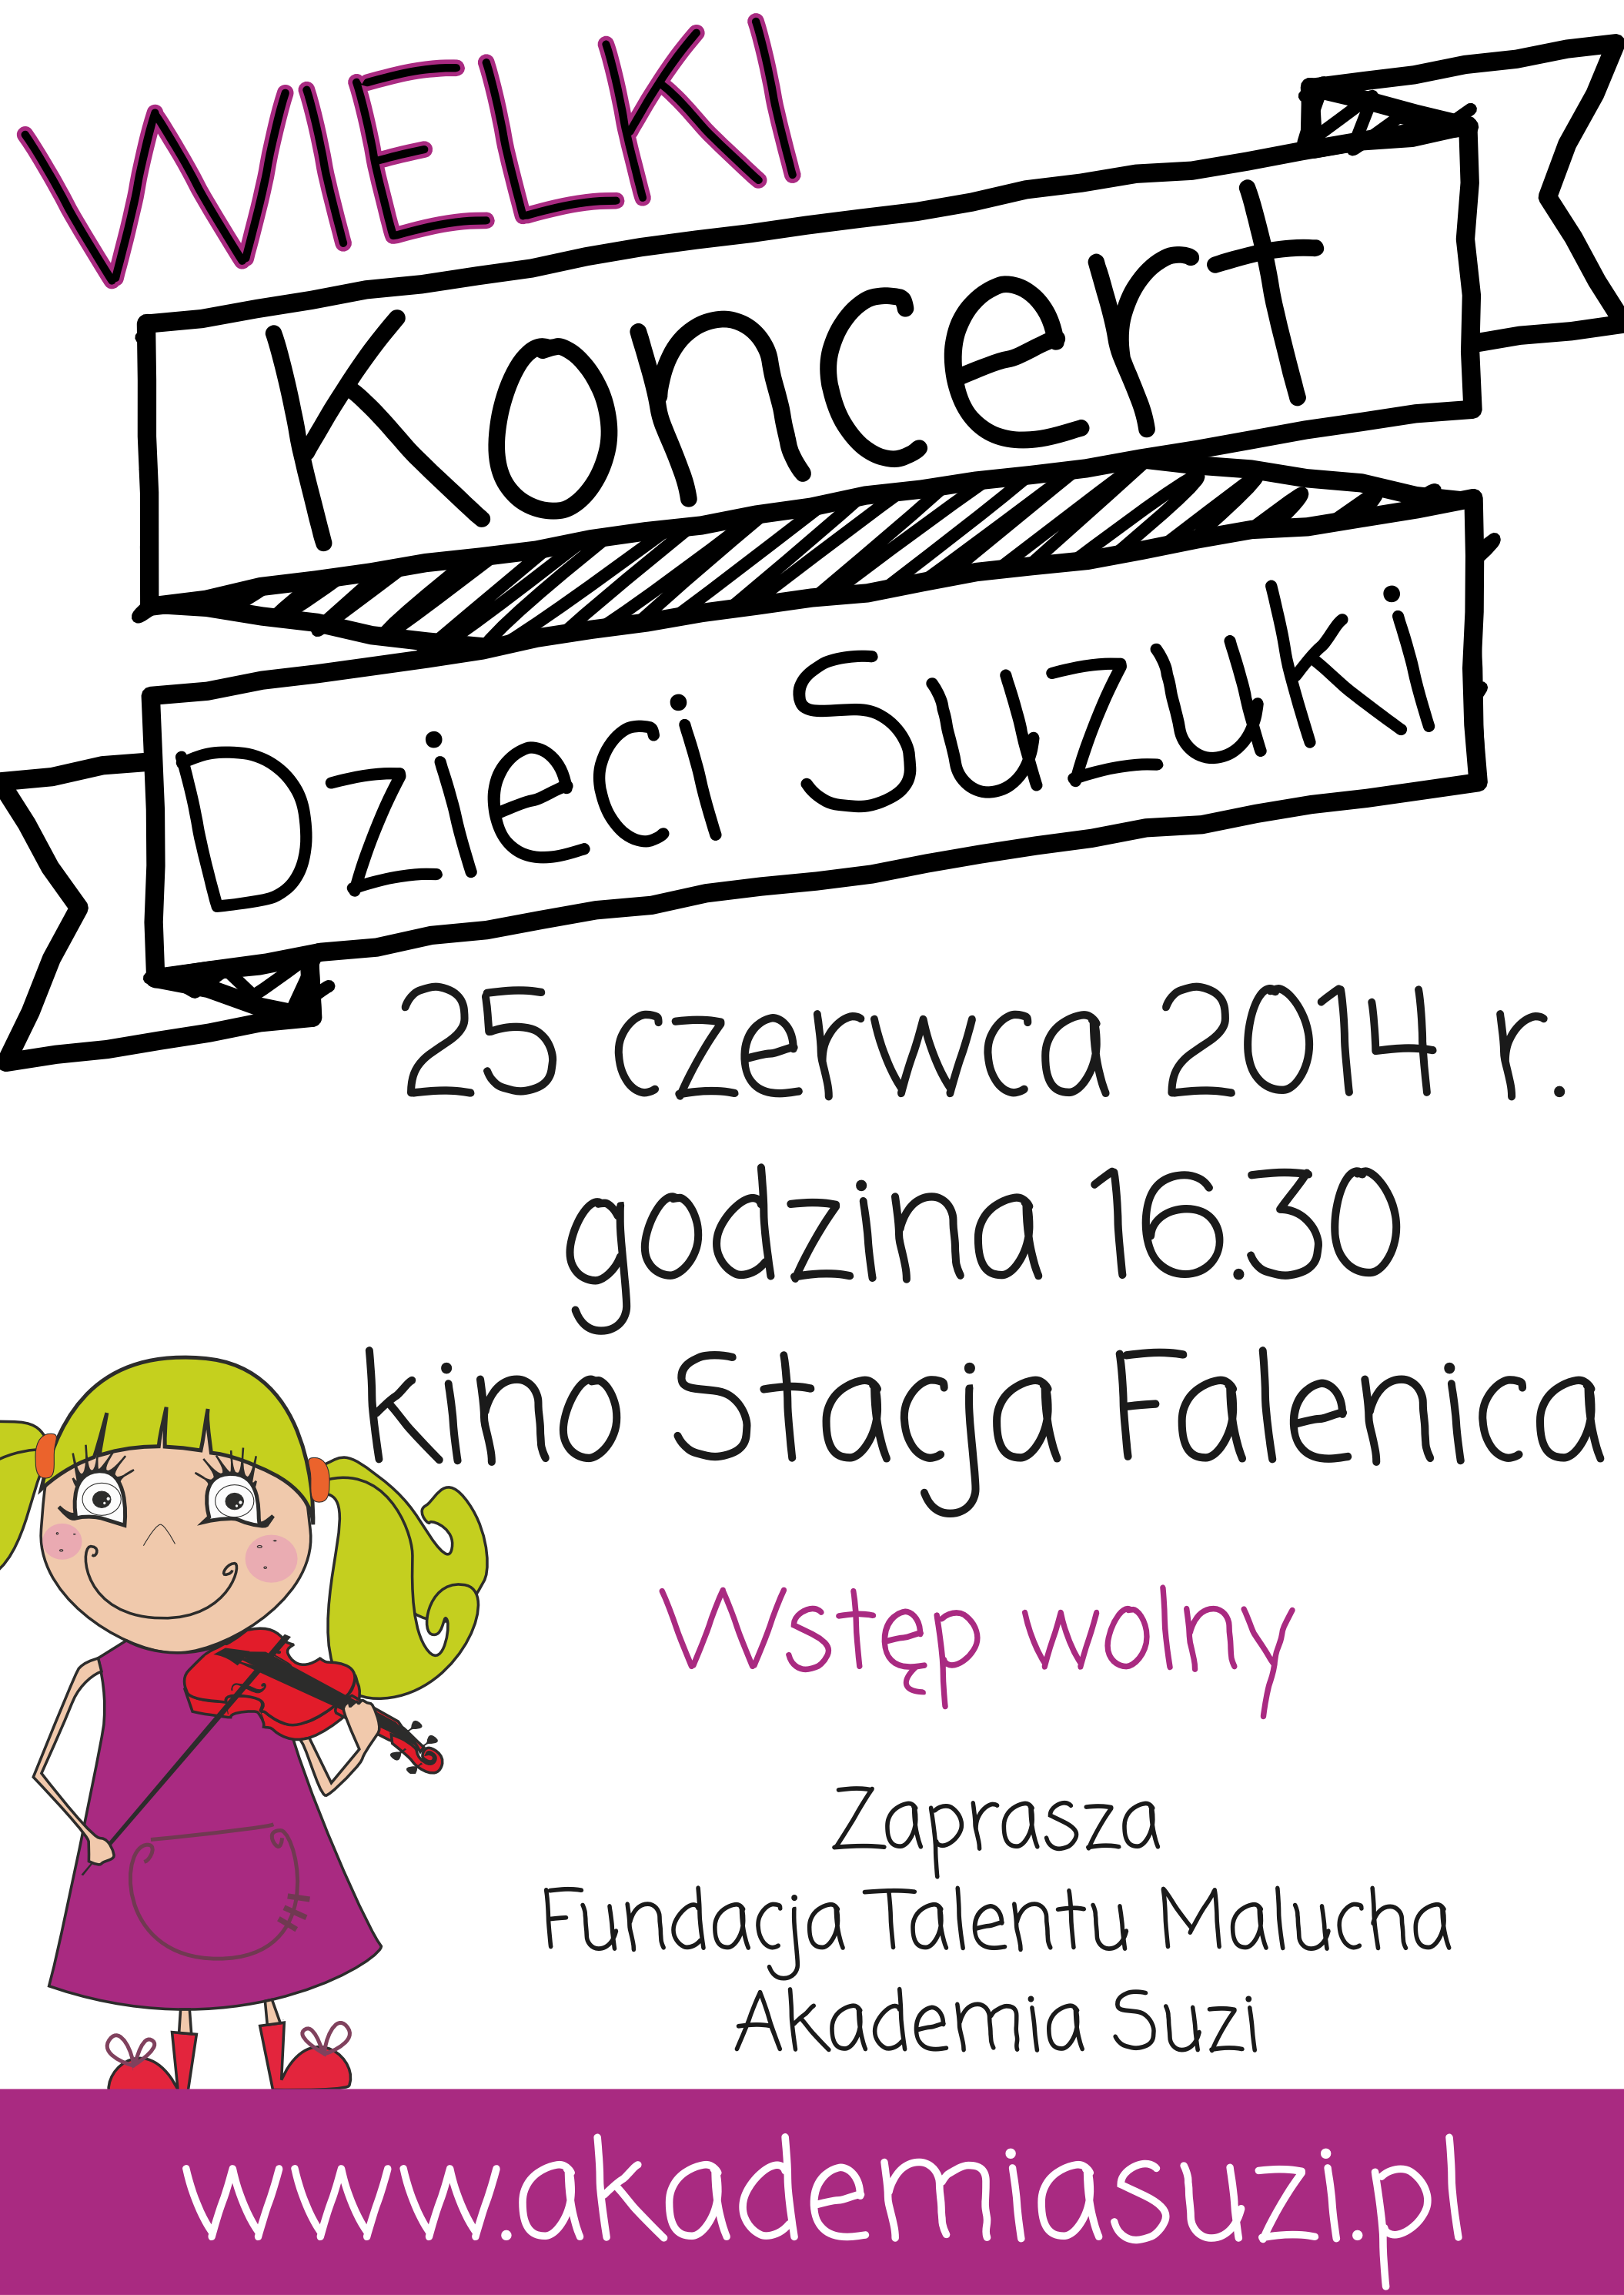 Wielki Koncert Dzieci Suzuki